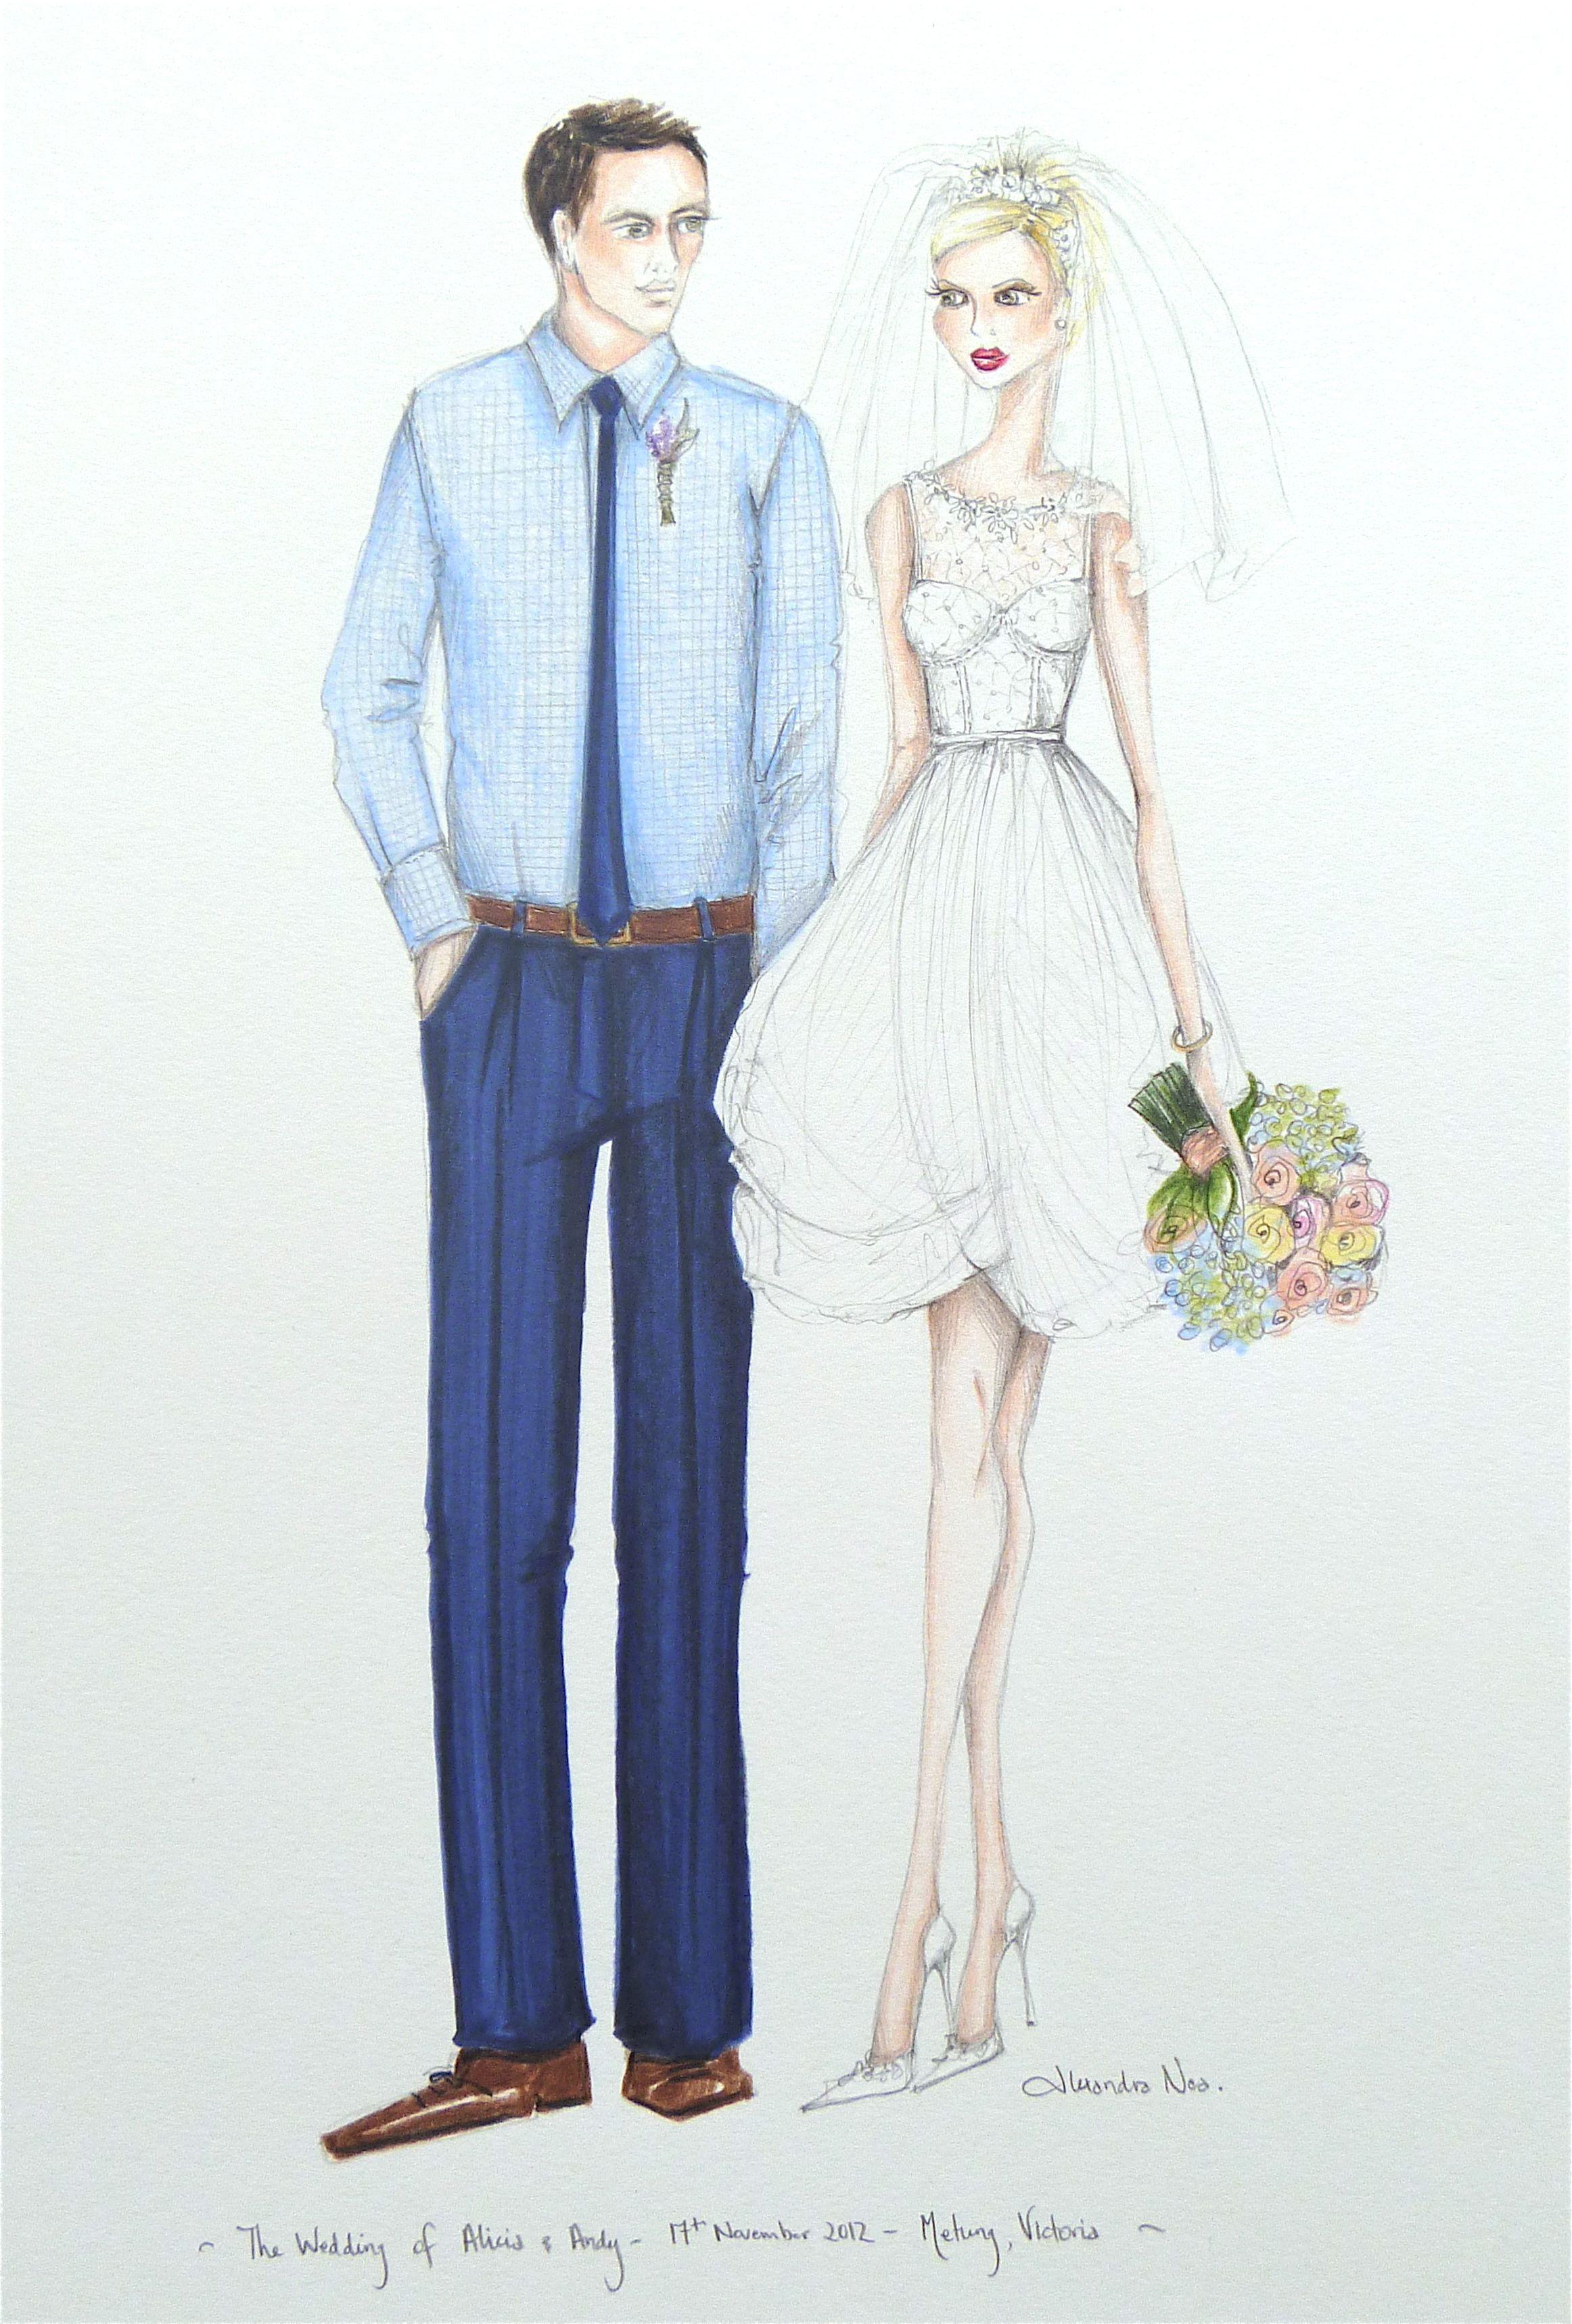 Alicia and Andy's retro wedding